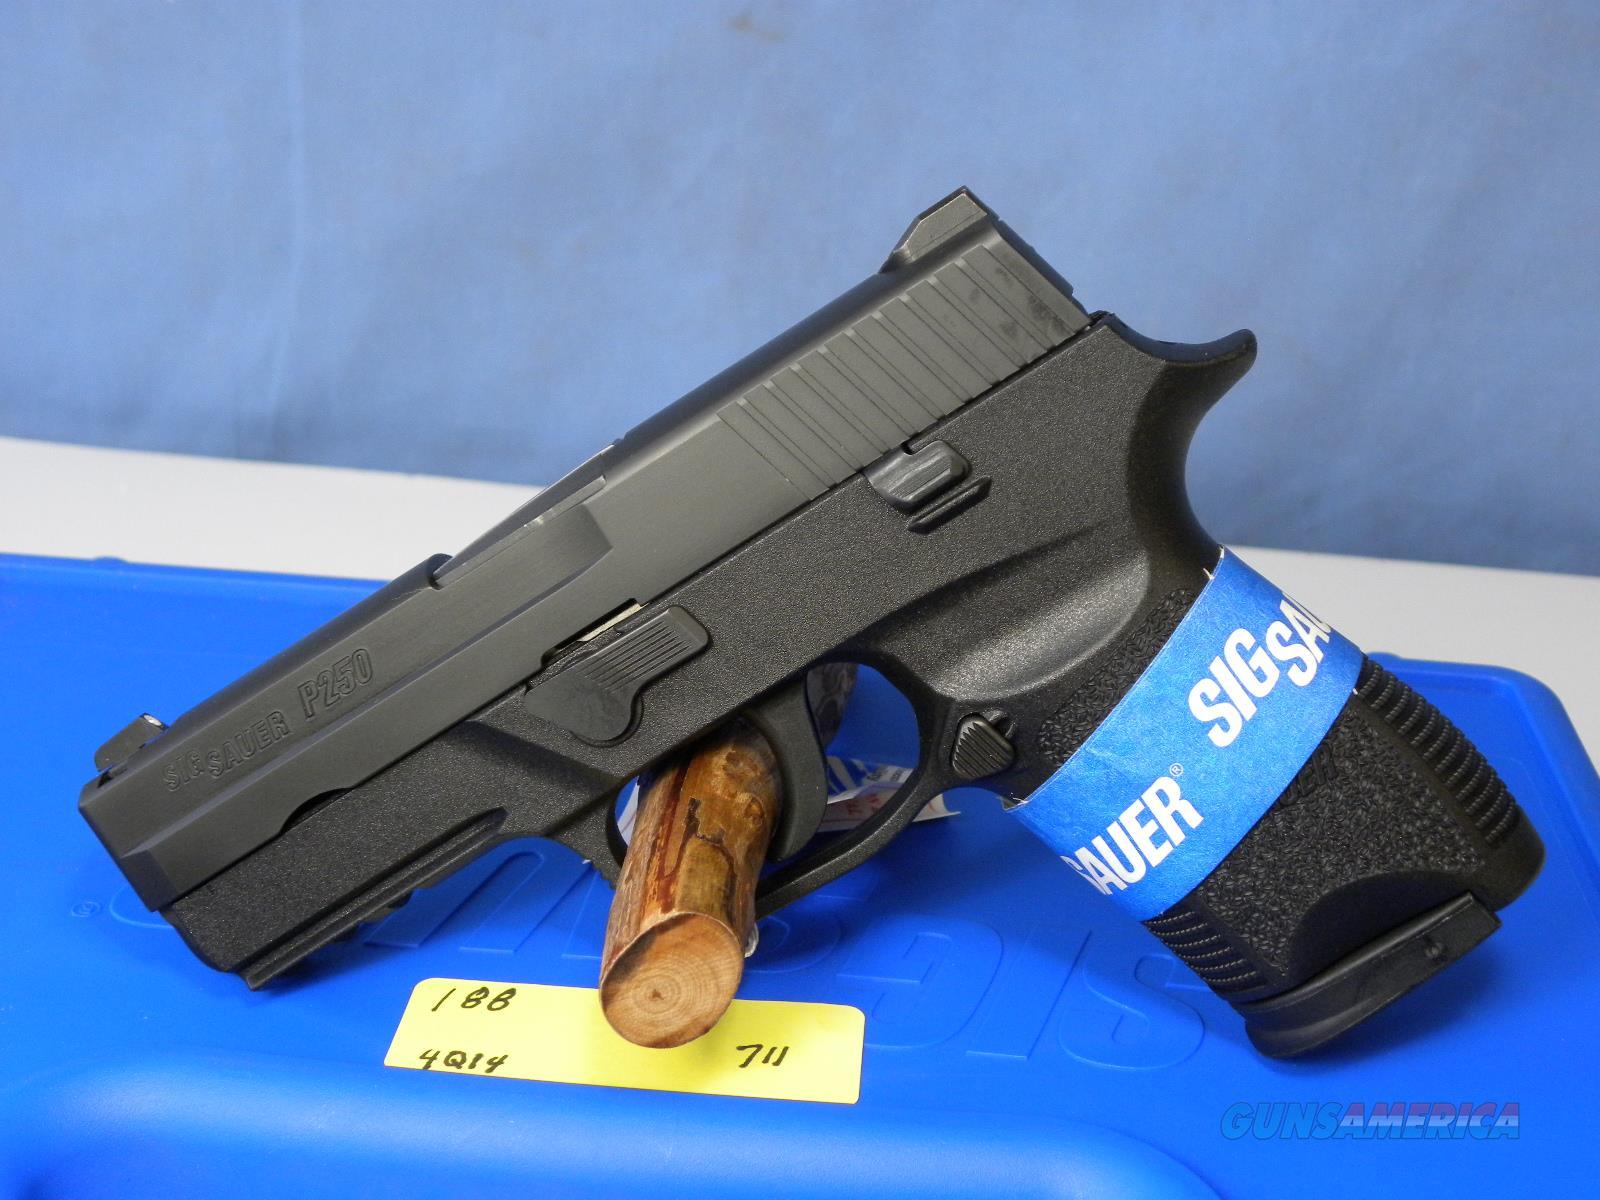 Sig Sauer 250 .40 S&W Compact  Guns > Pistols > Sig - Sauer/Sigarms Pistols > P250